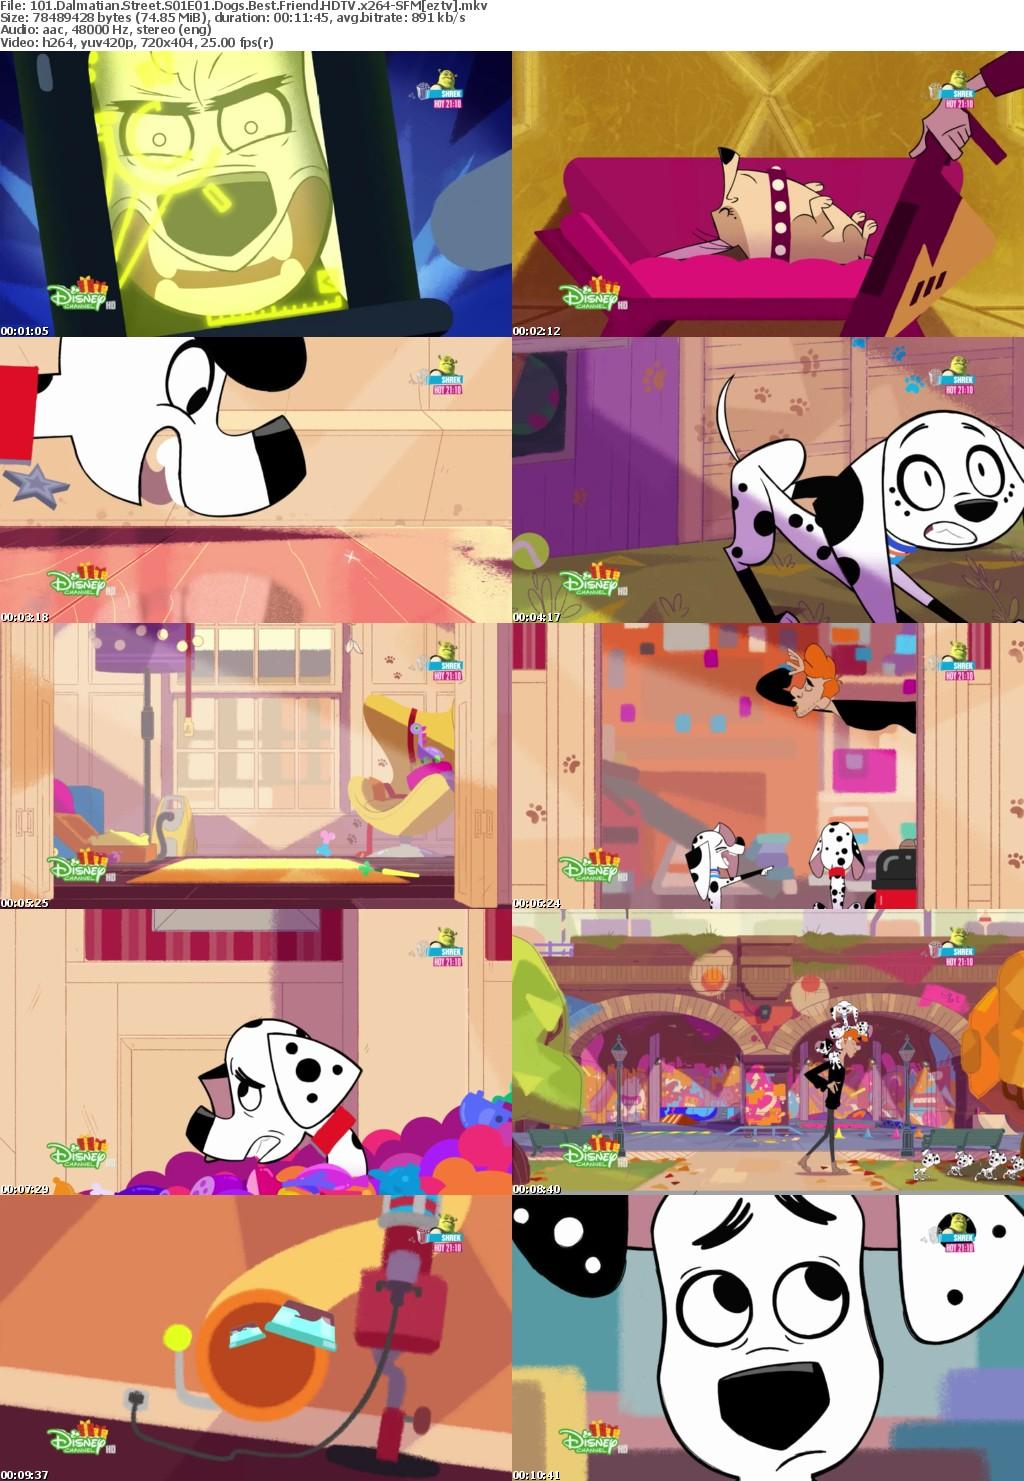 101 Dalmatian Street S01E01 Dogs Best Friend HDTV x264-SFM